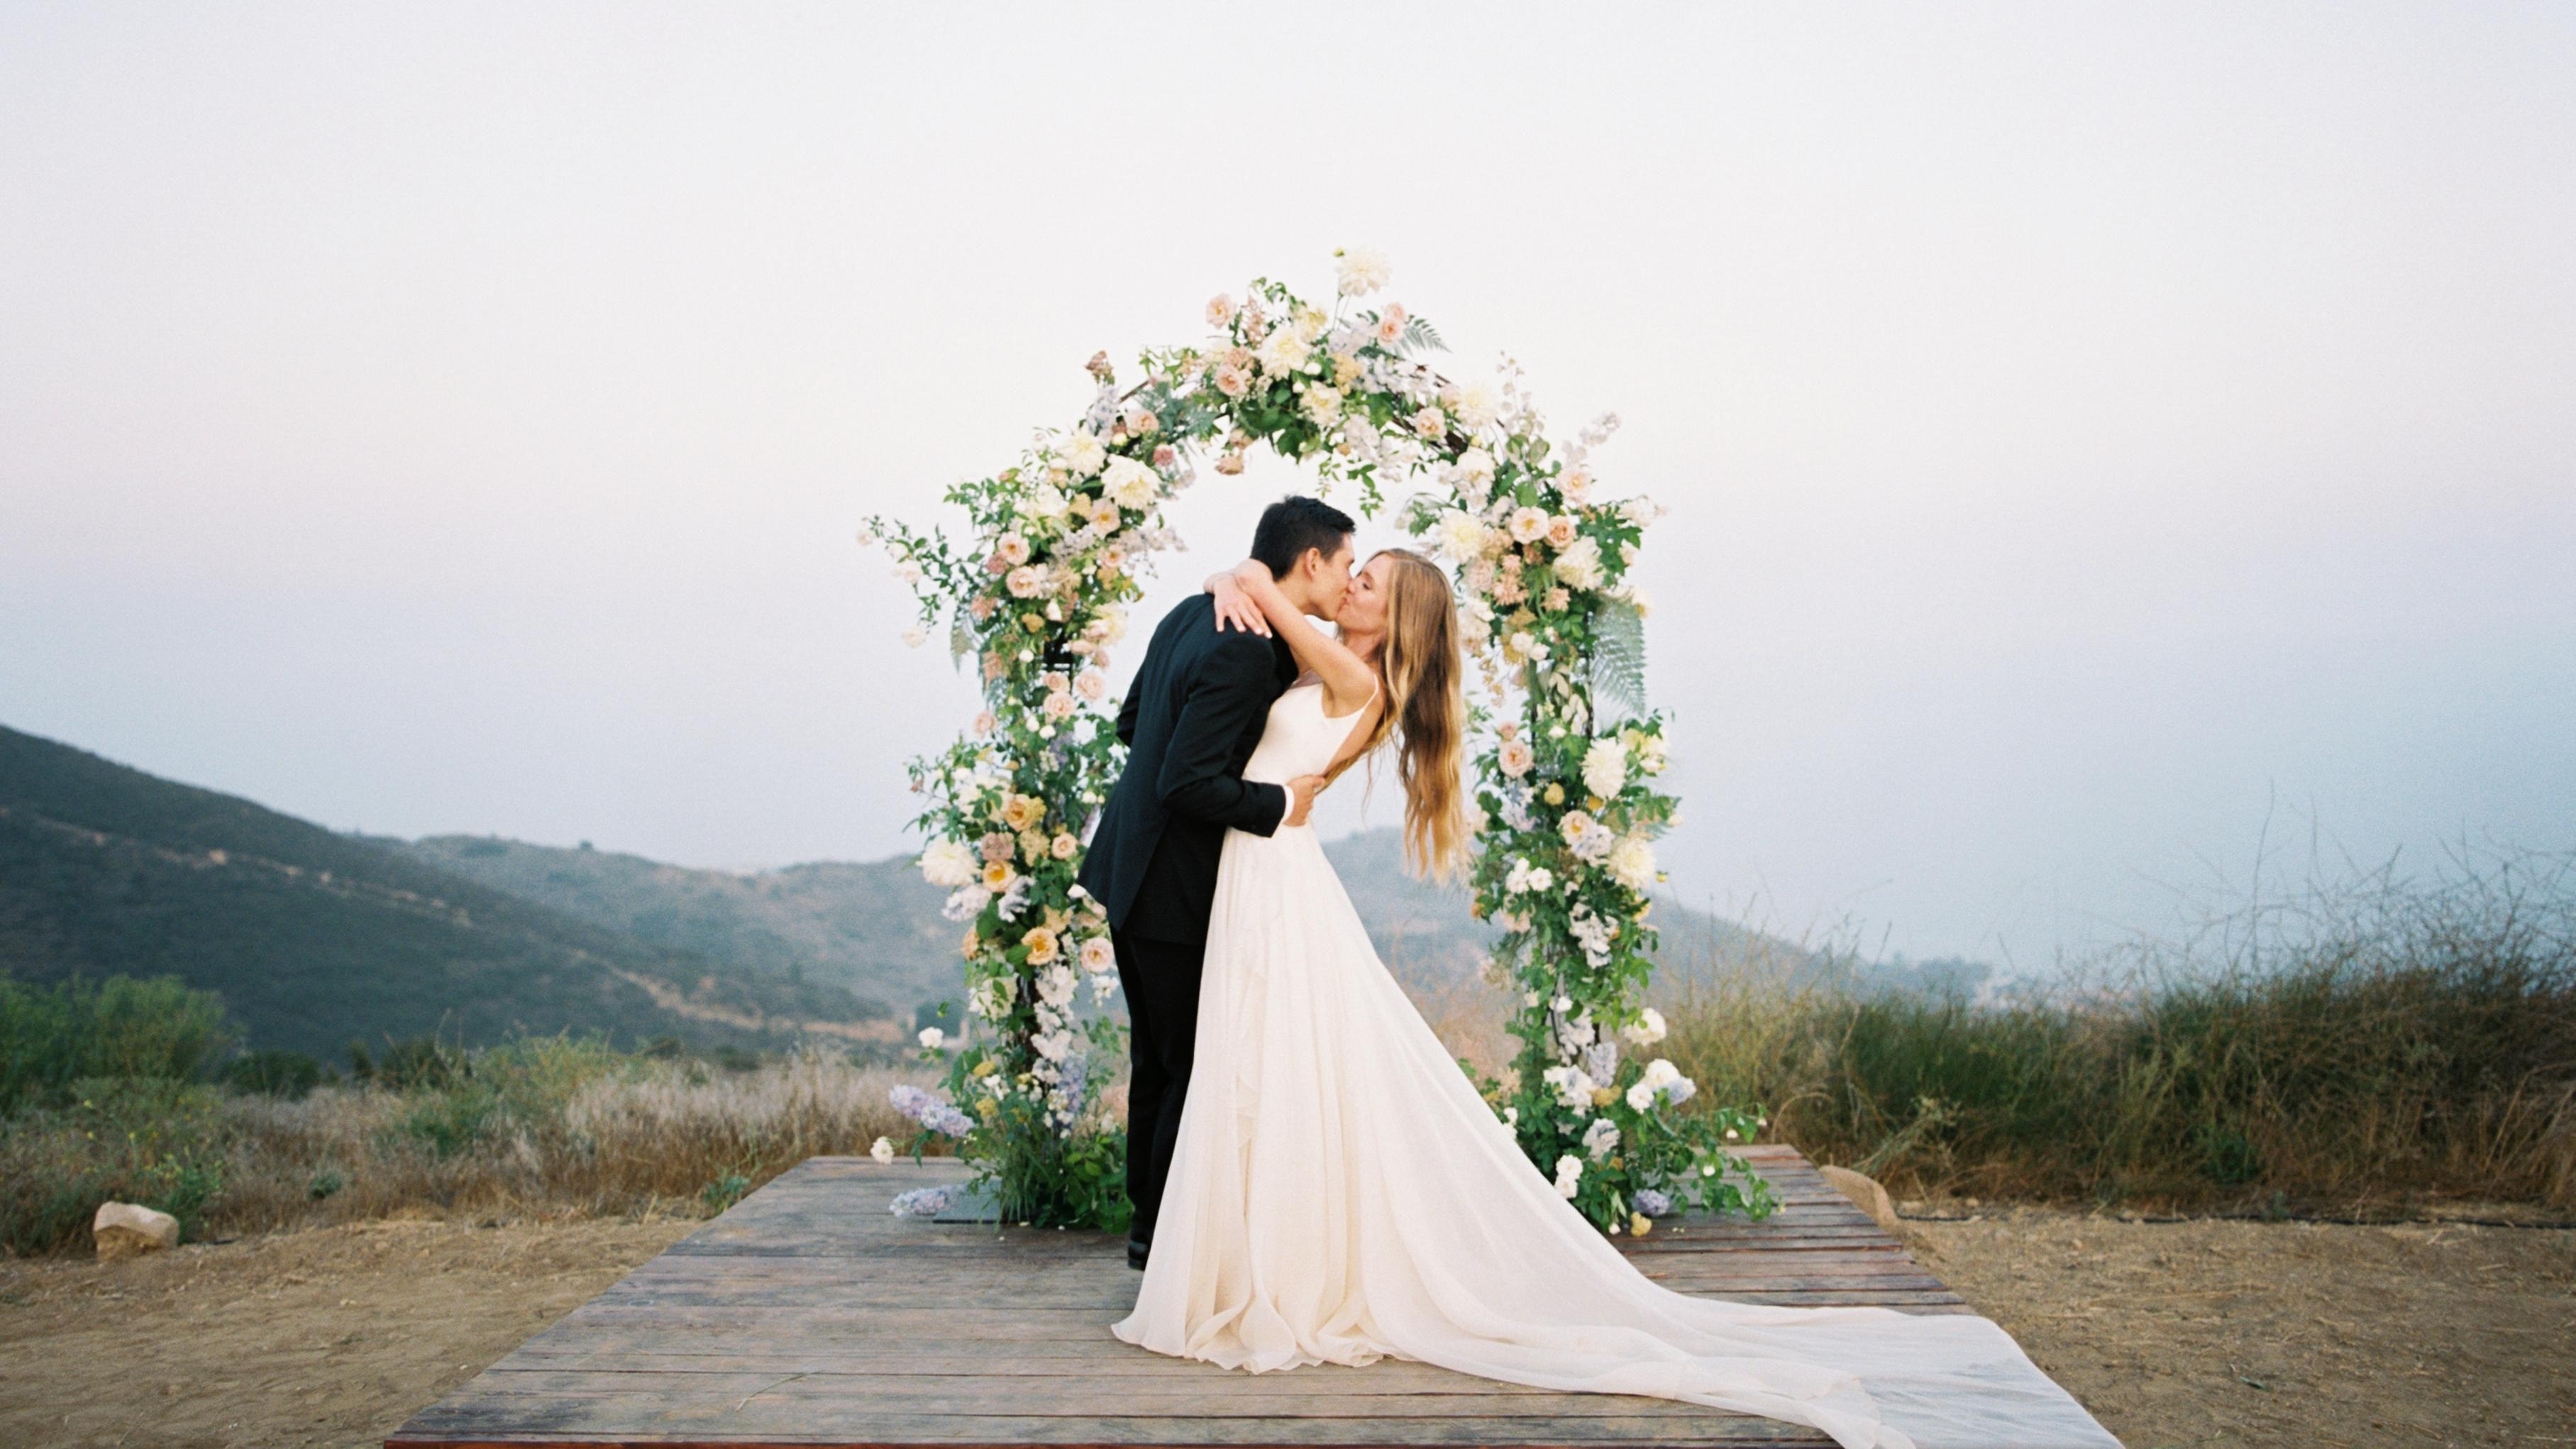 A Magical Malibu Wedding Overlooking The Pacific Ocean